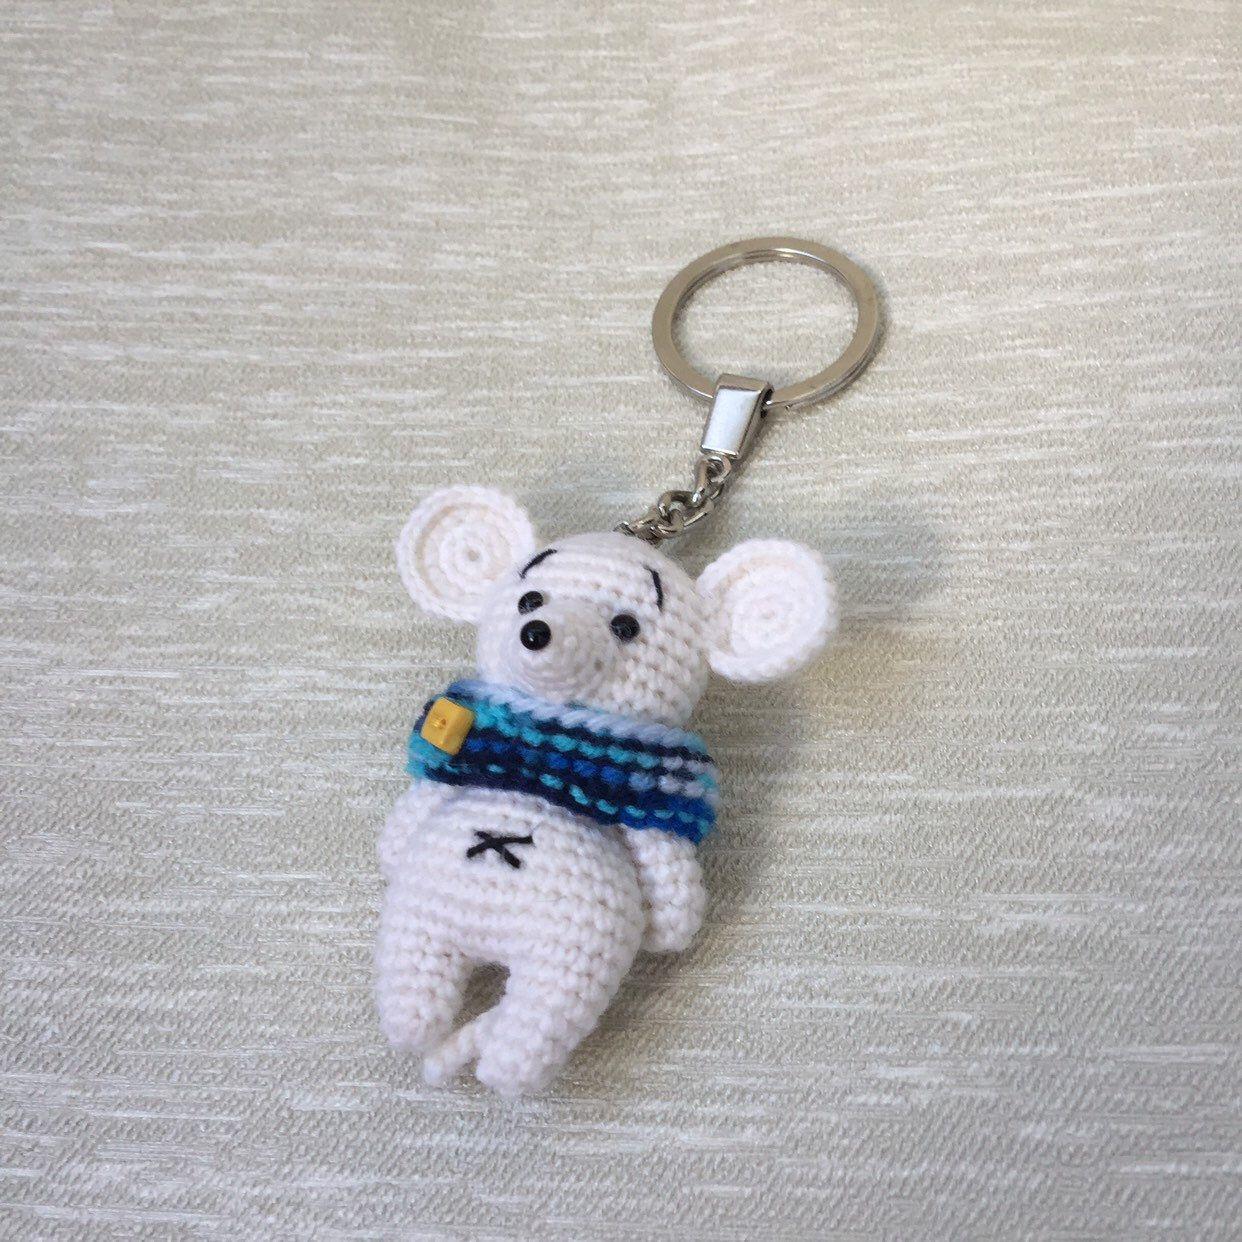 Amigurumi Little Mouse Crochet Free Patterns - Crochet & Knitting | 1242x1242